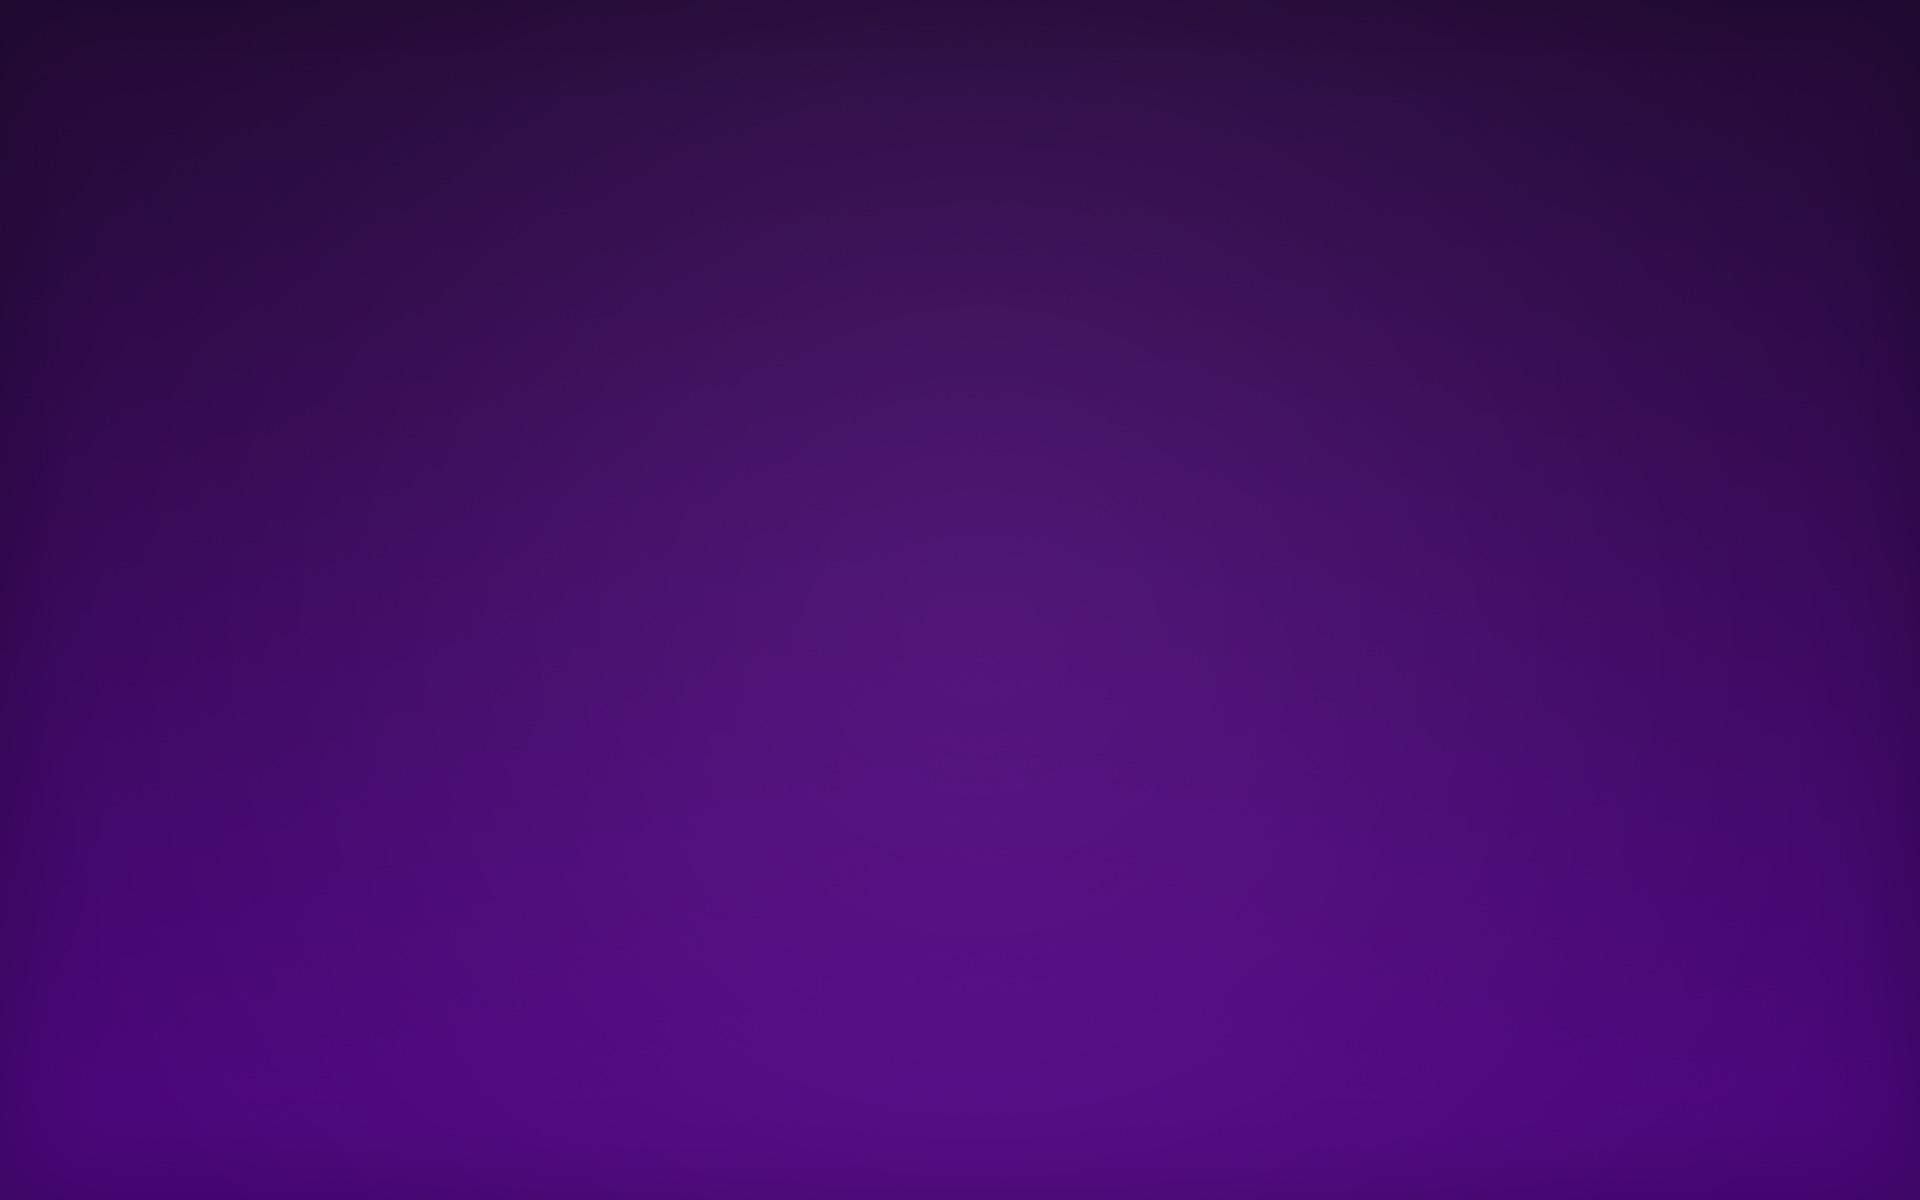 Cute Love Quotes Mobile Wallpapers Purple Wallpaper Widescreen Hd 7093 Wallpaper Walldiskpaper